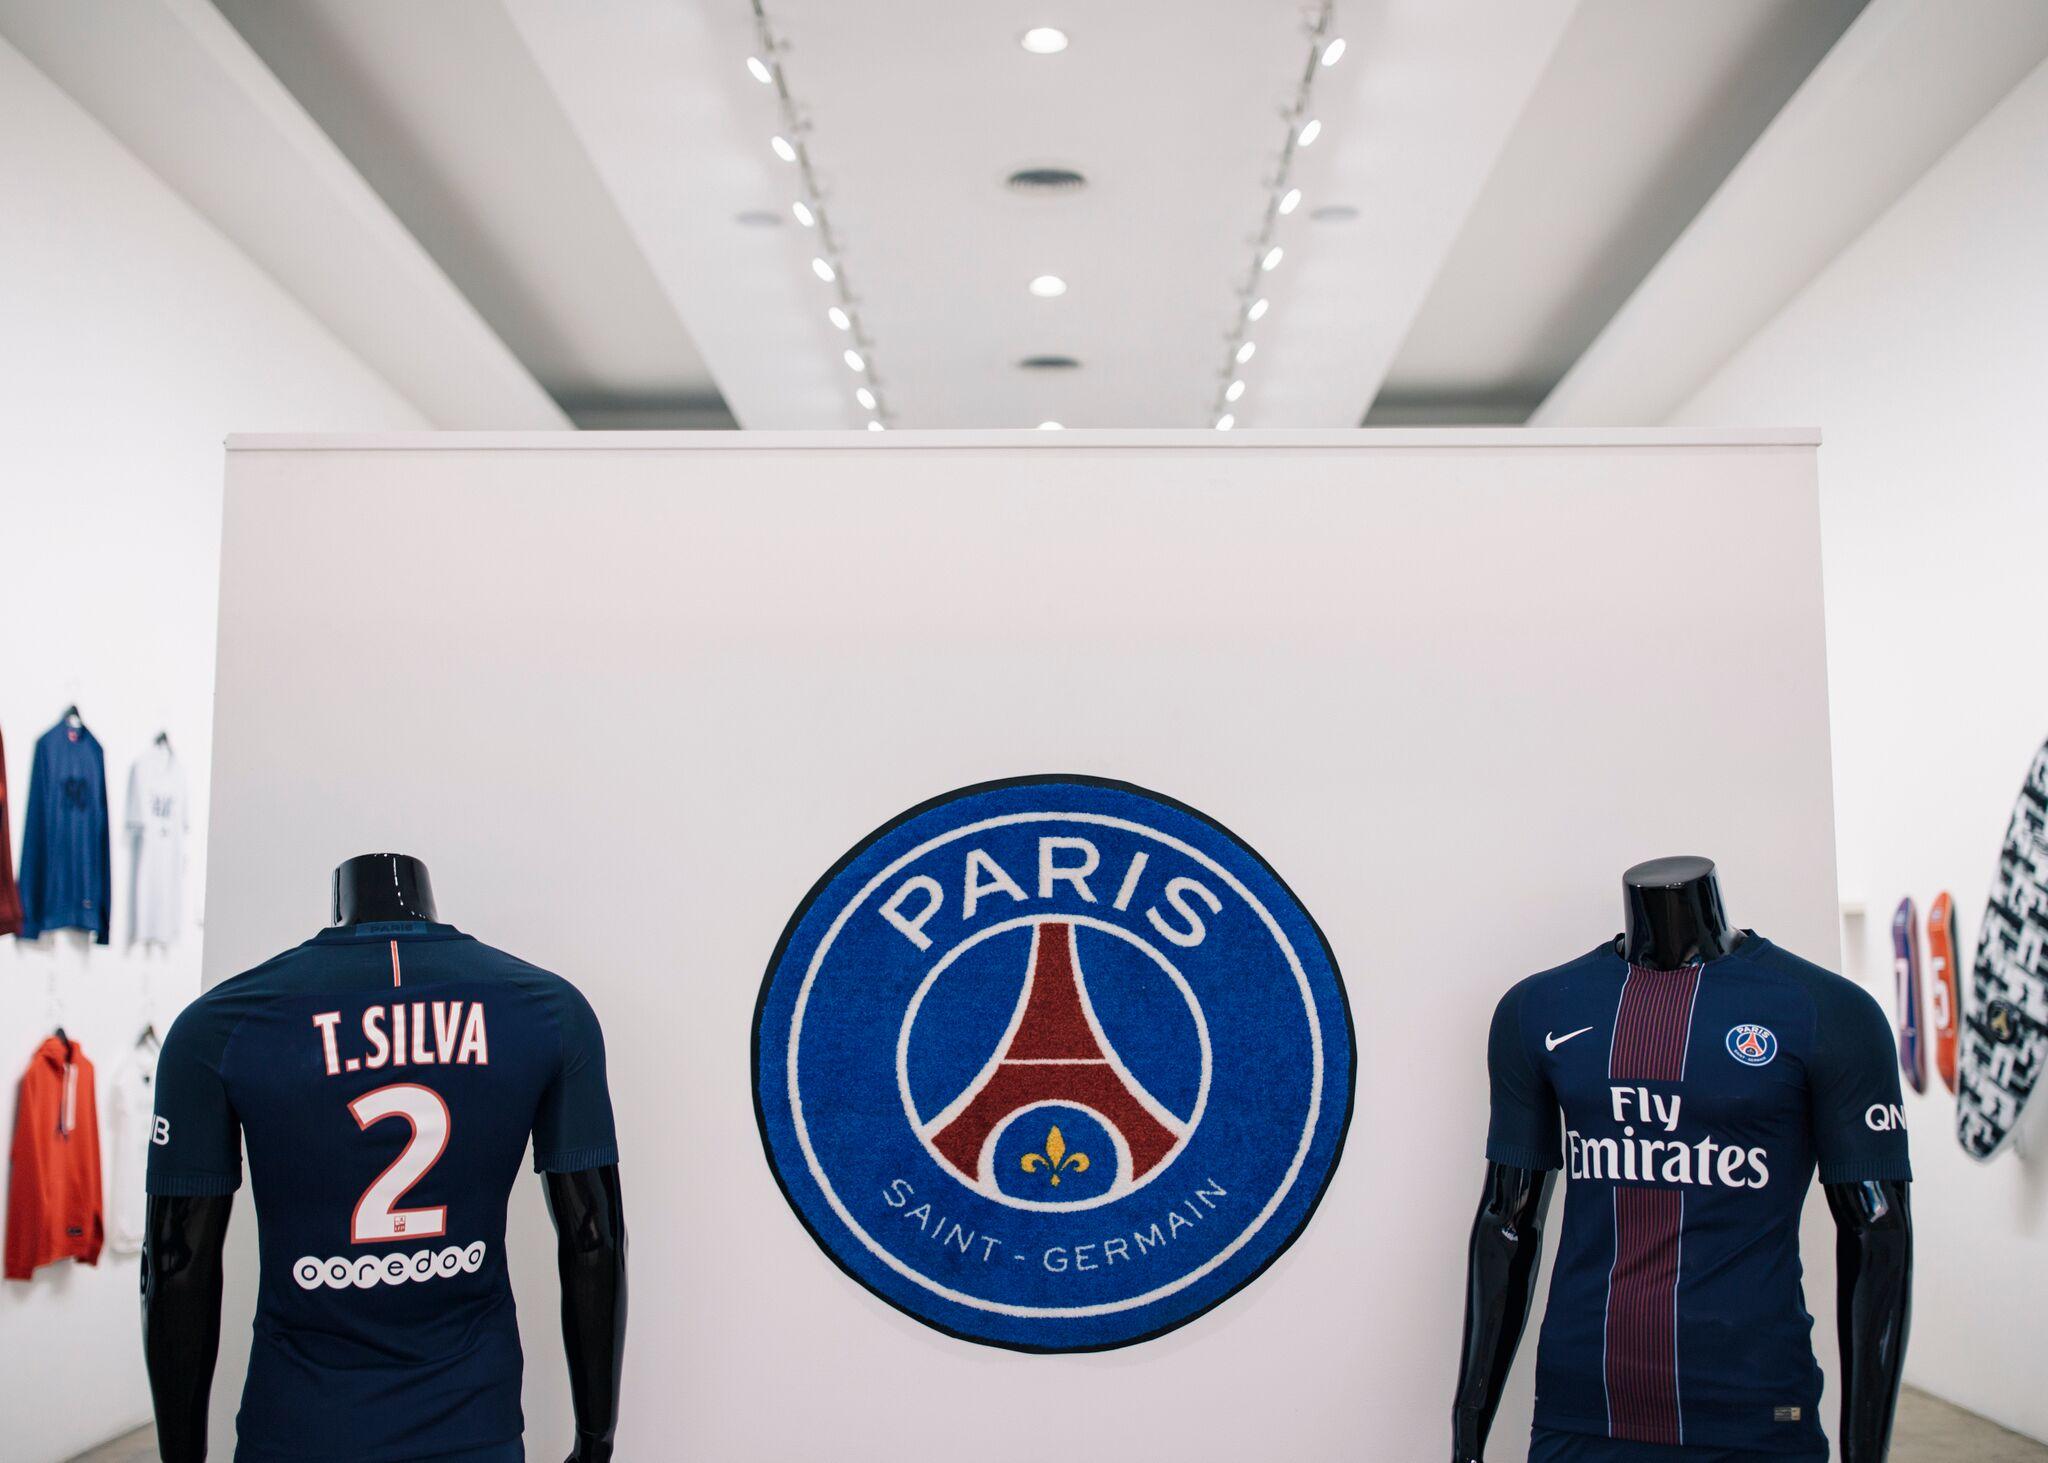 AntonioBrasko-Paris-SaintGermain-LaGalerie-PopUp-TheSeventhLetter-LosAngeles-ArtGallery-Art-Design-Graffiti-SprayPaint-Boombox-Soccer-Futbol-PSG 22.jpg